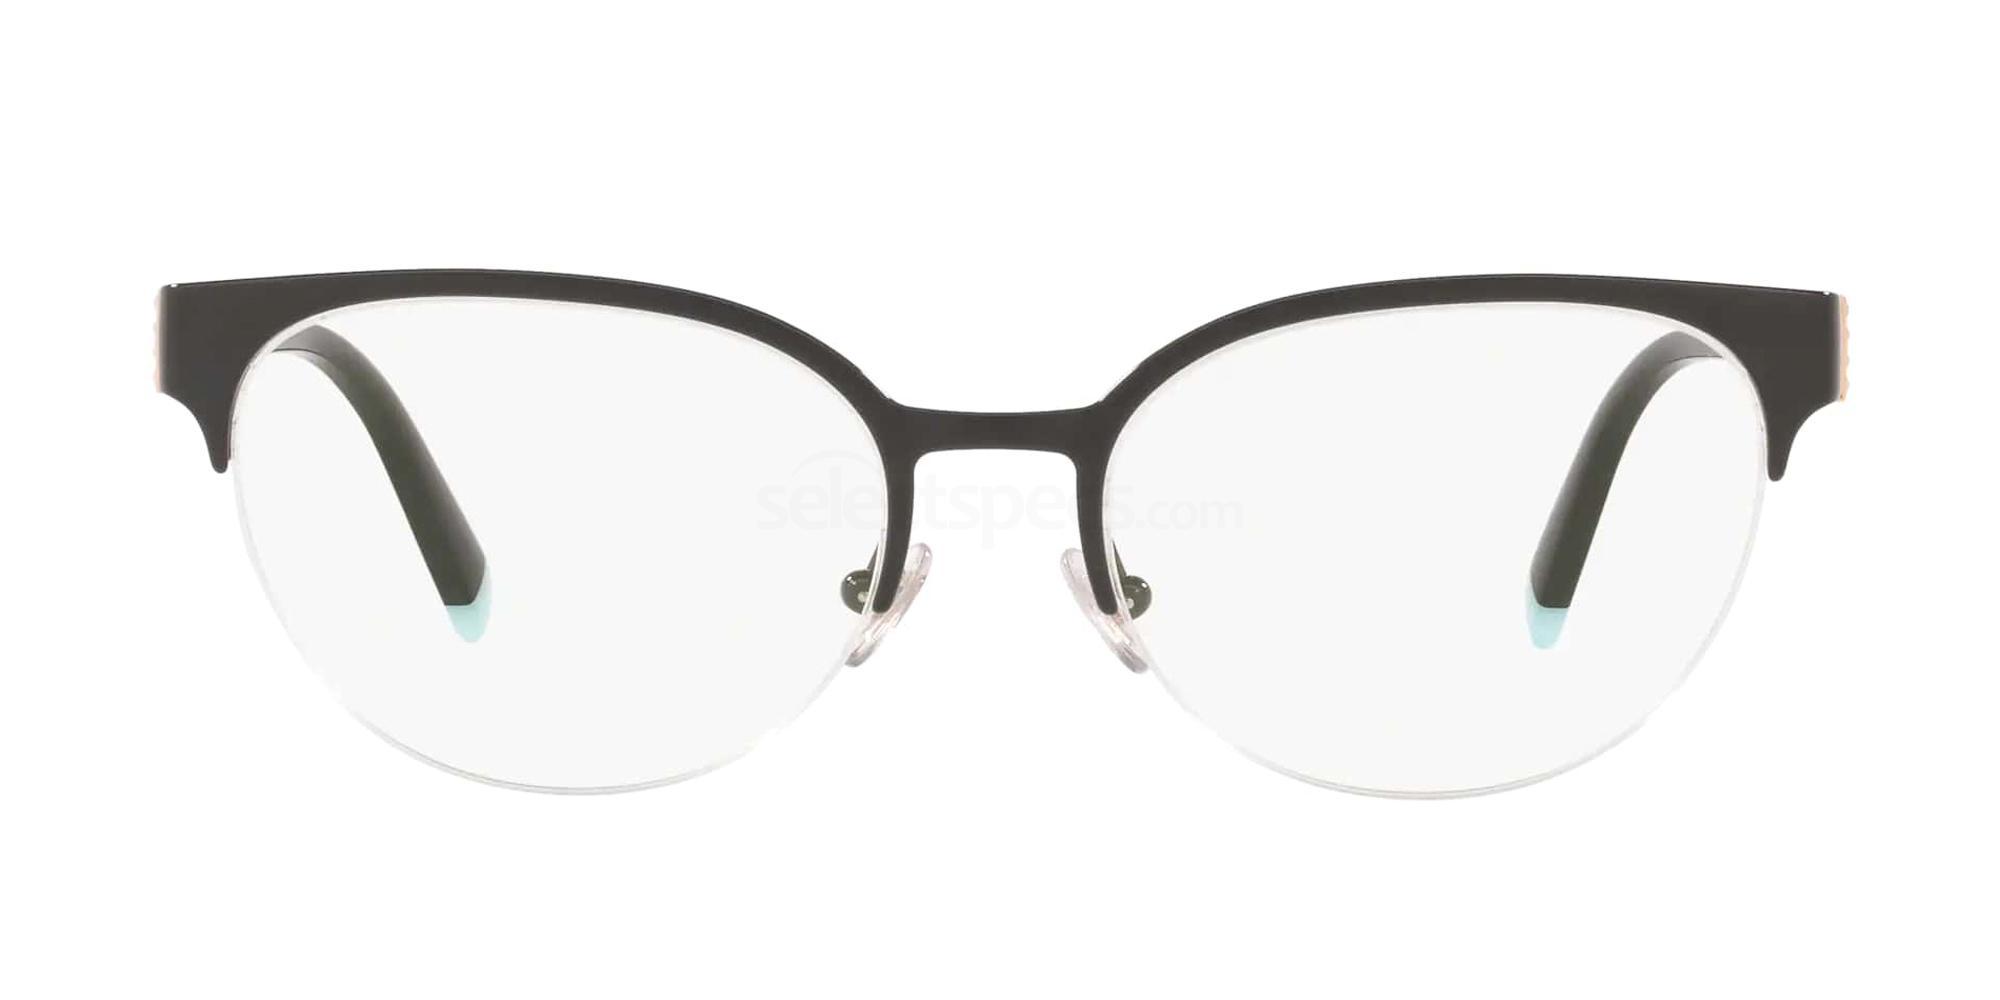 6007 TF1133 Glasses, Tiffany & Co.